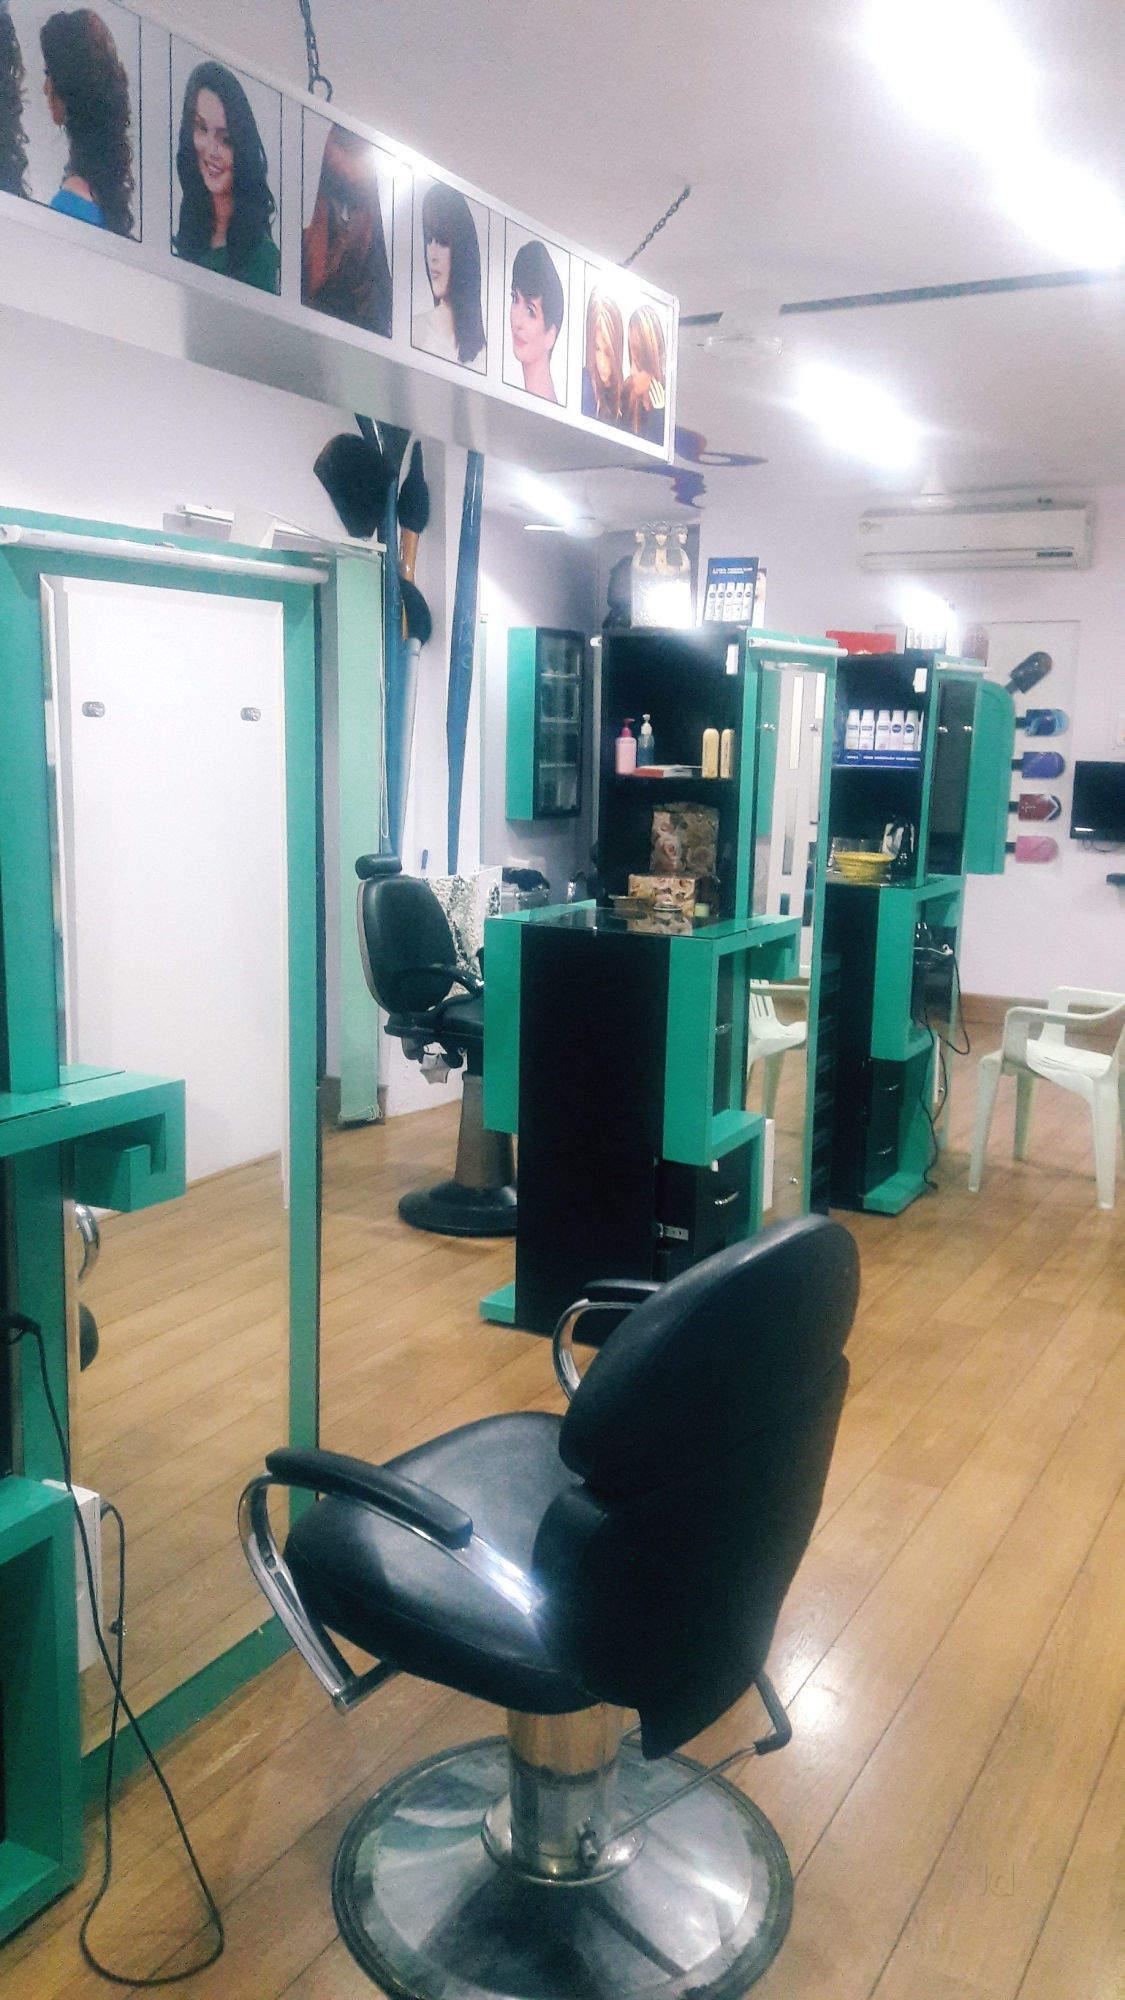 Affus Beauty Parlour - Tarnaka - Hyderabad Image